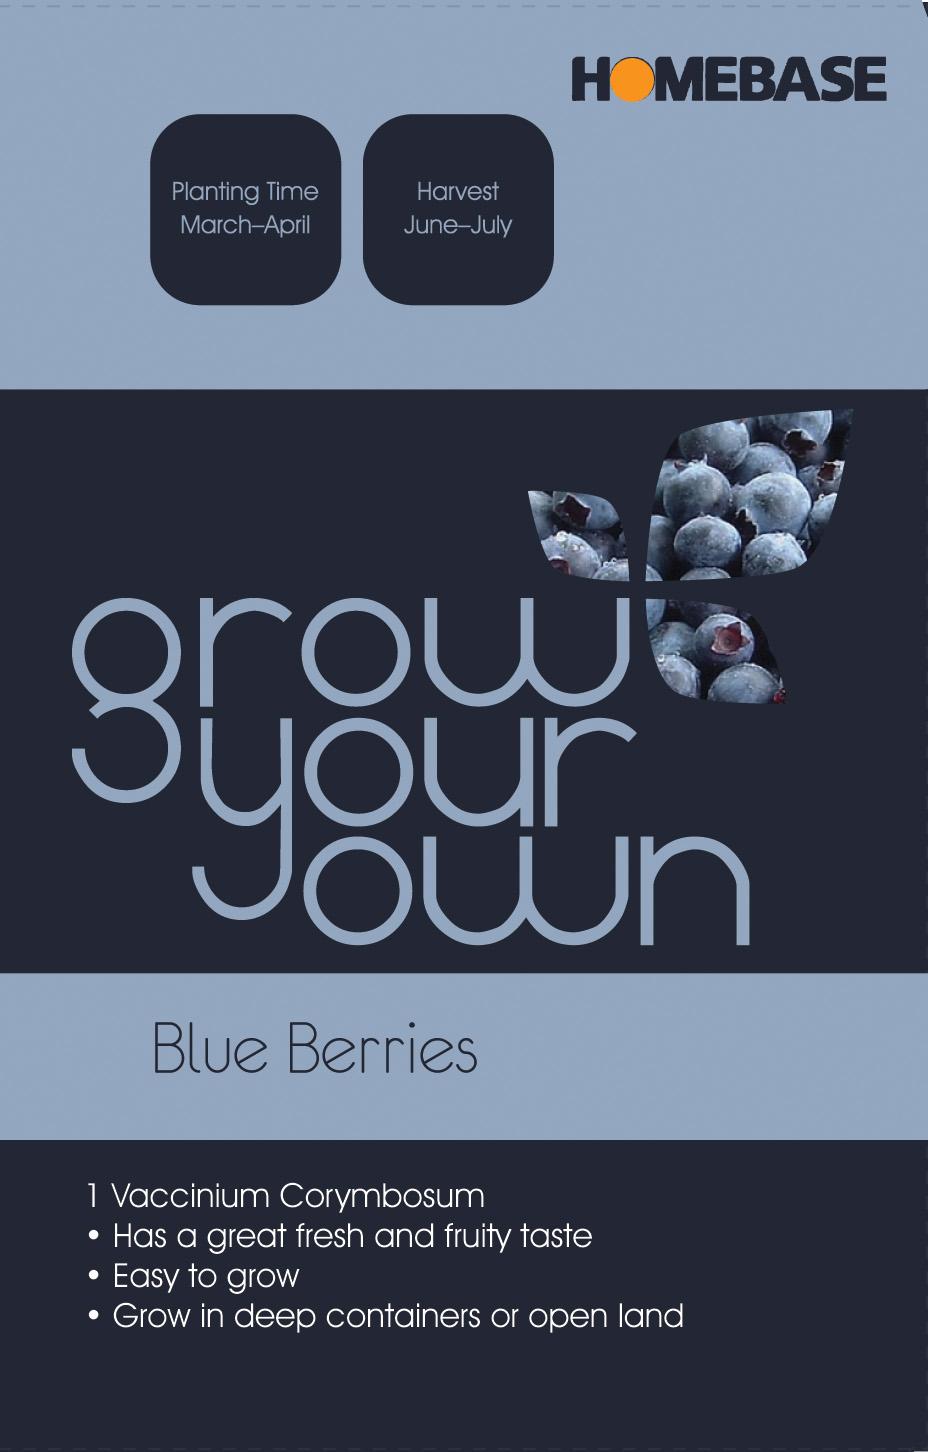 [blueberry+frony]